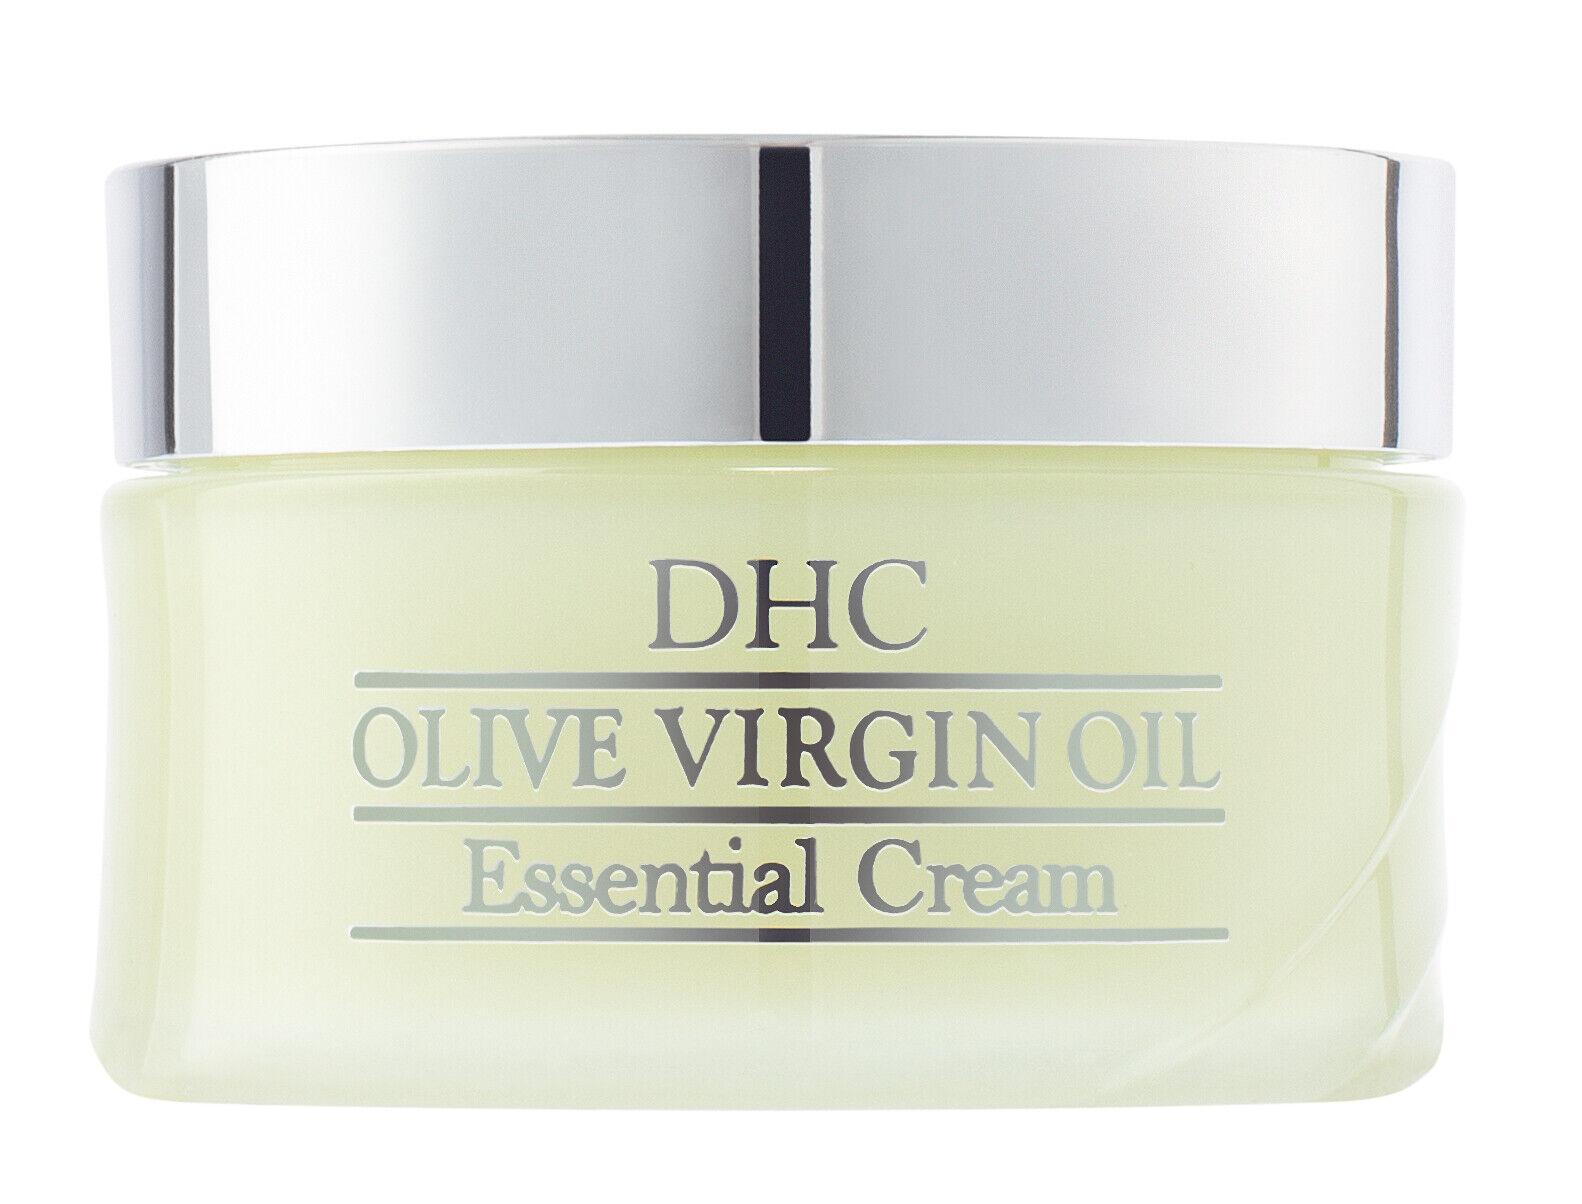 DHC Olive Virgin Oil Essential Cream, 1.7 oz, includes four